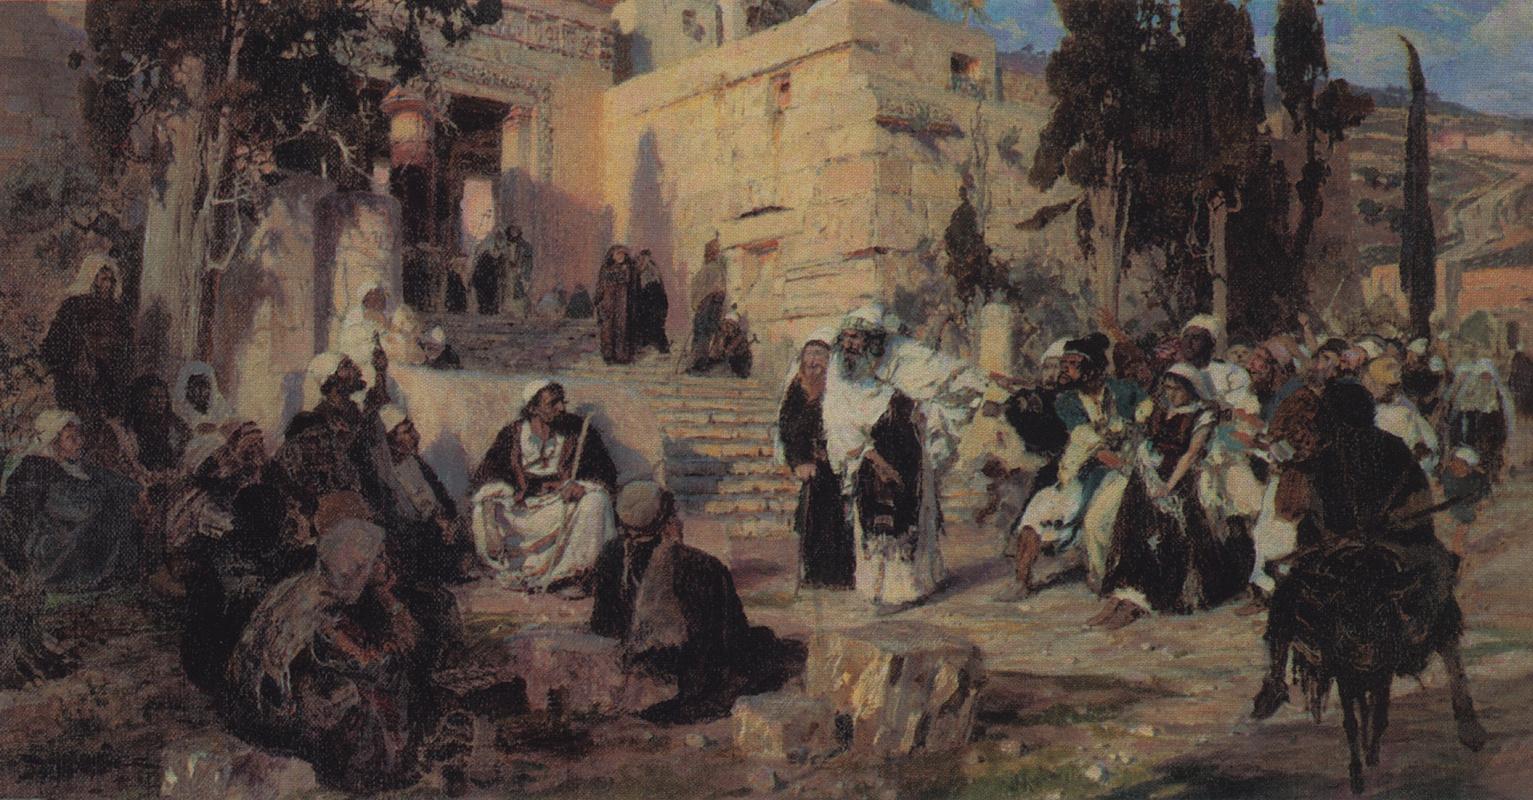 Vasily Polenov. Christ and the sinner. Sketch